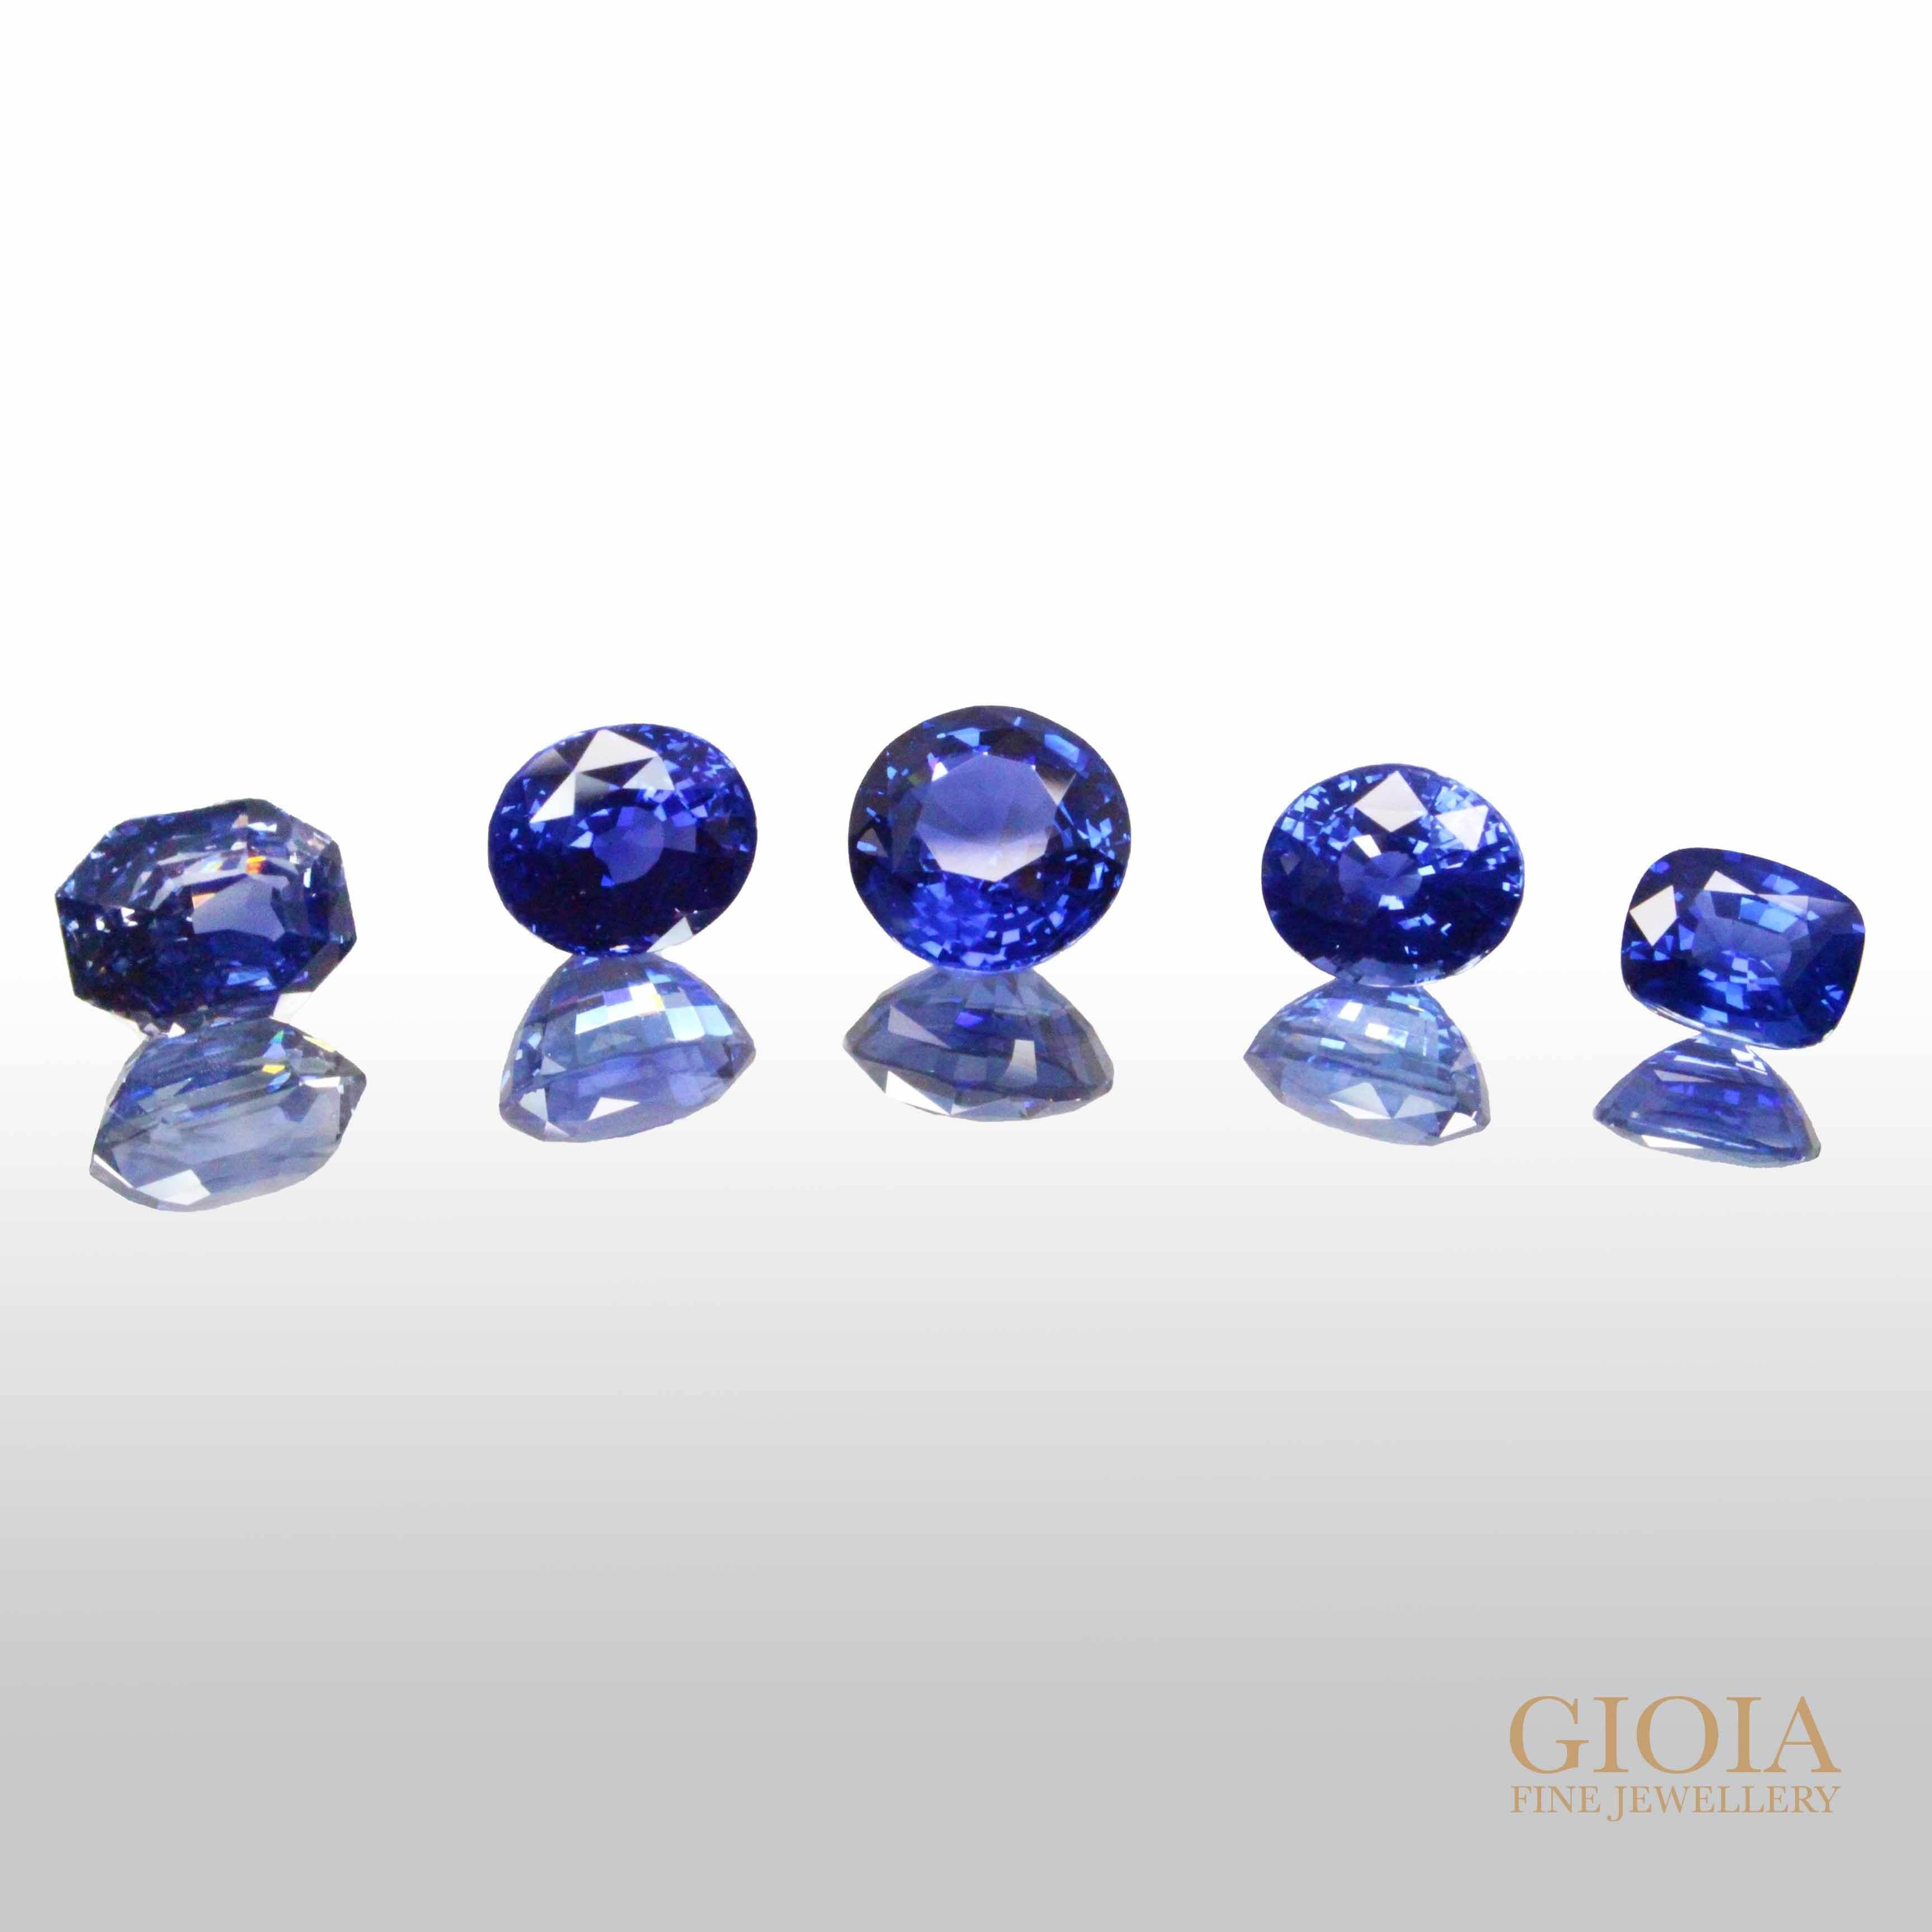 Rare unheated Blue Sapphire   Custom made wedding engagement ring with sapphire   Local Singapore Customised Jeweller